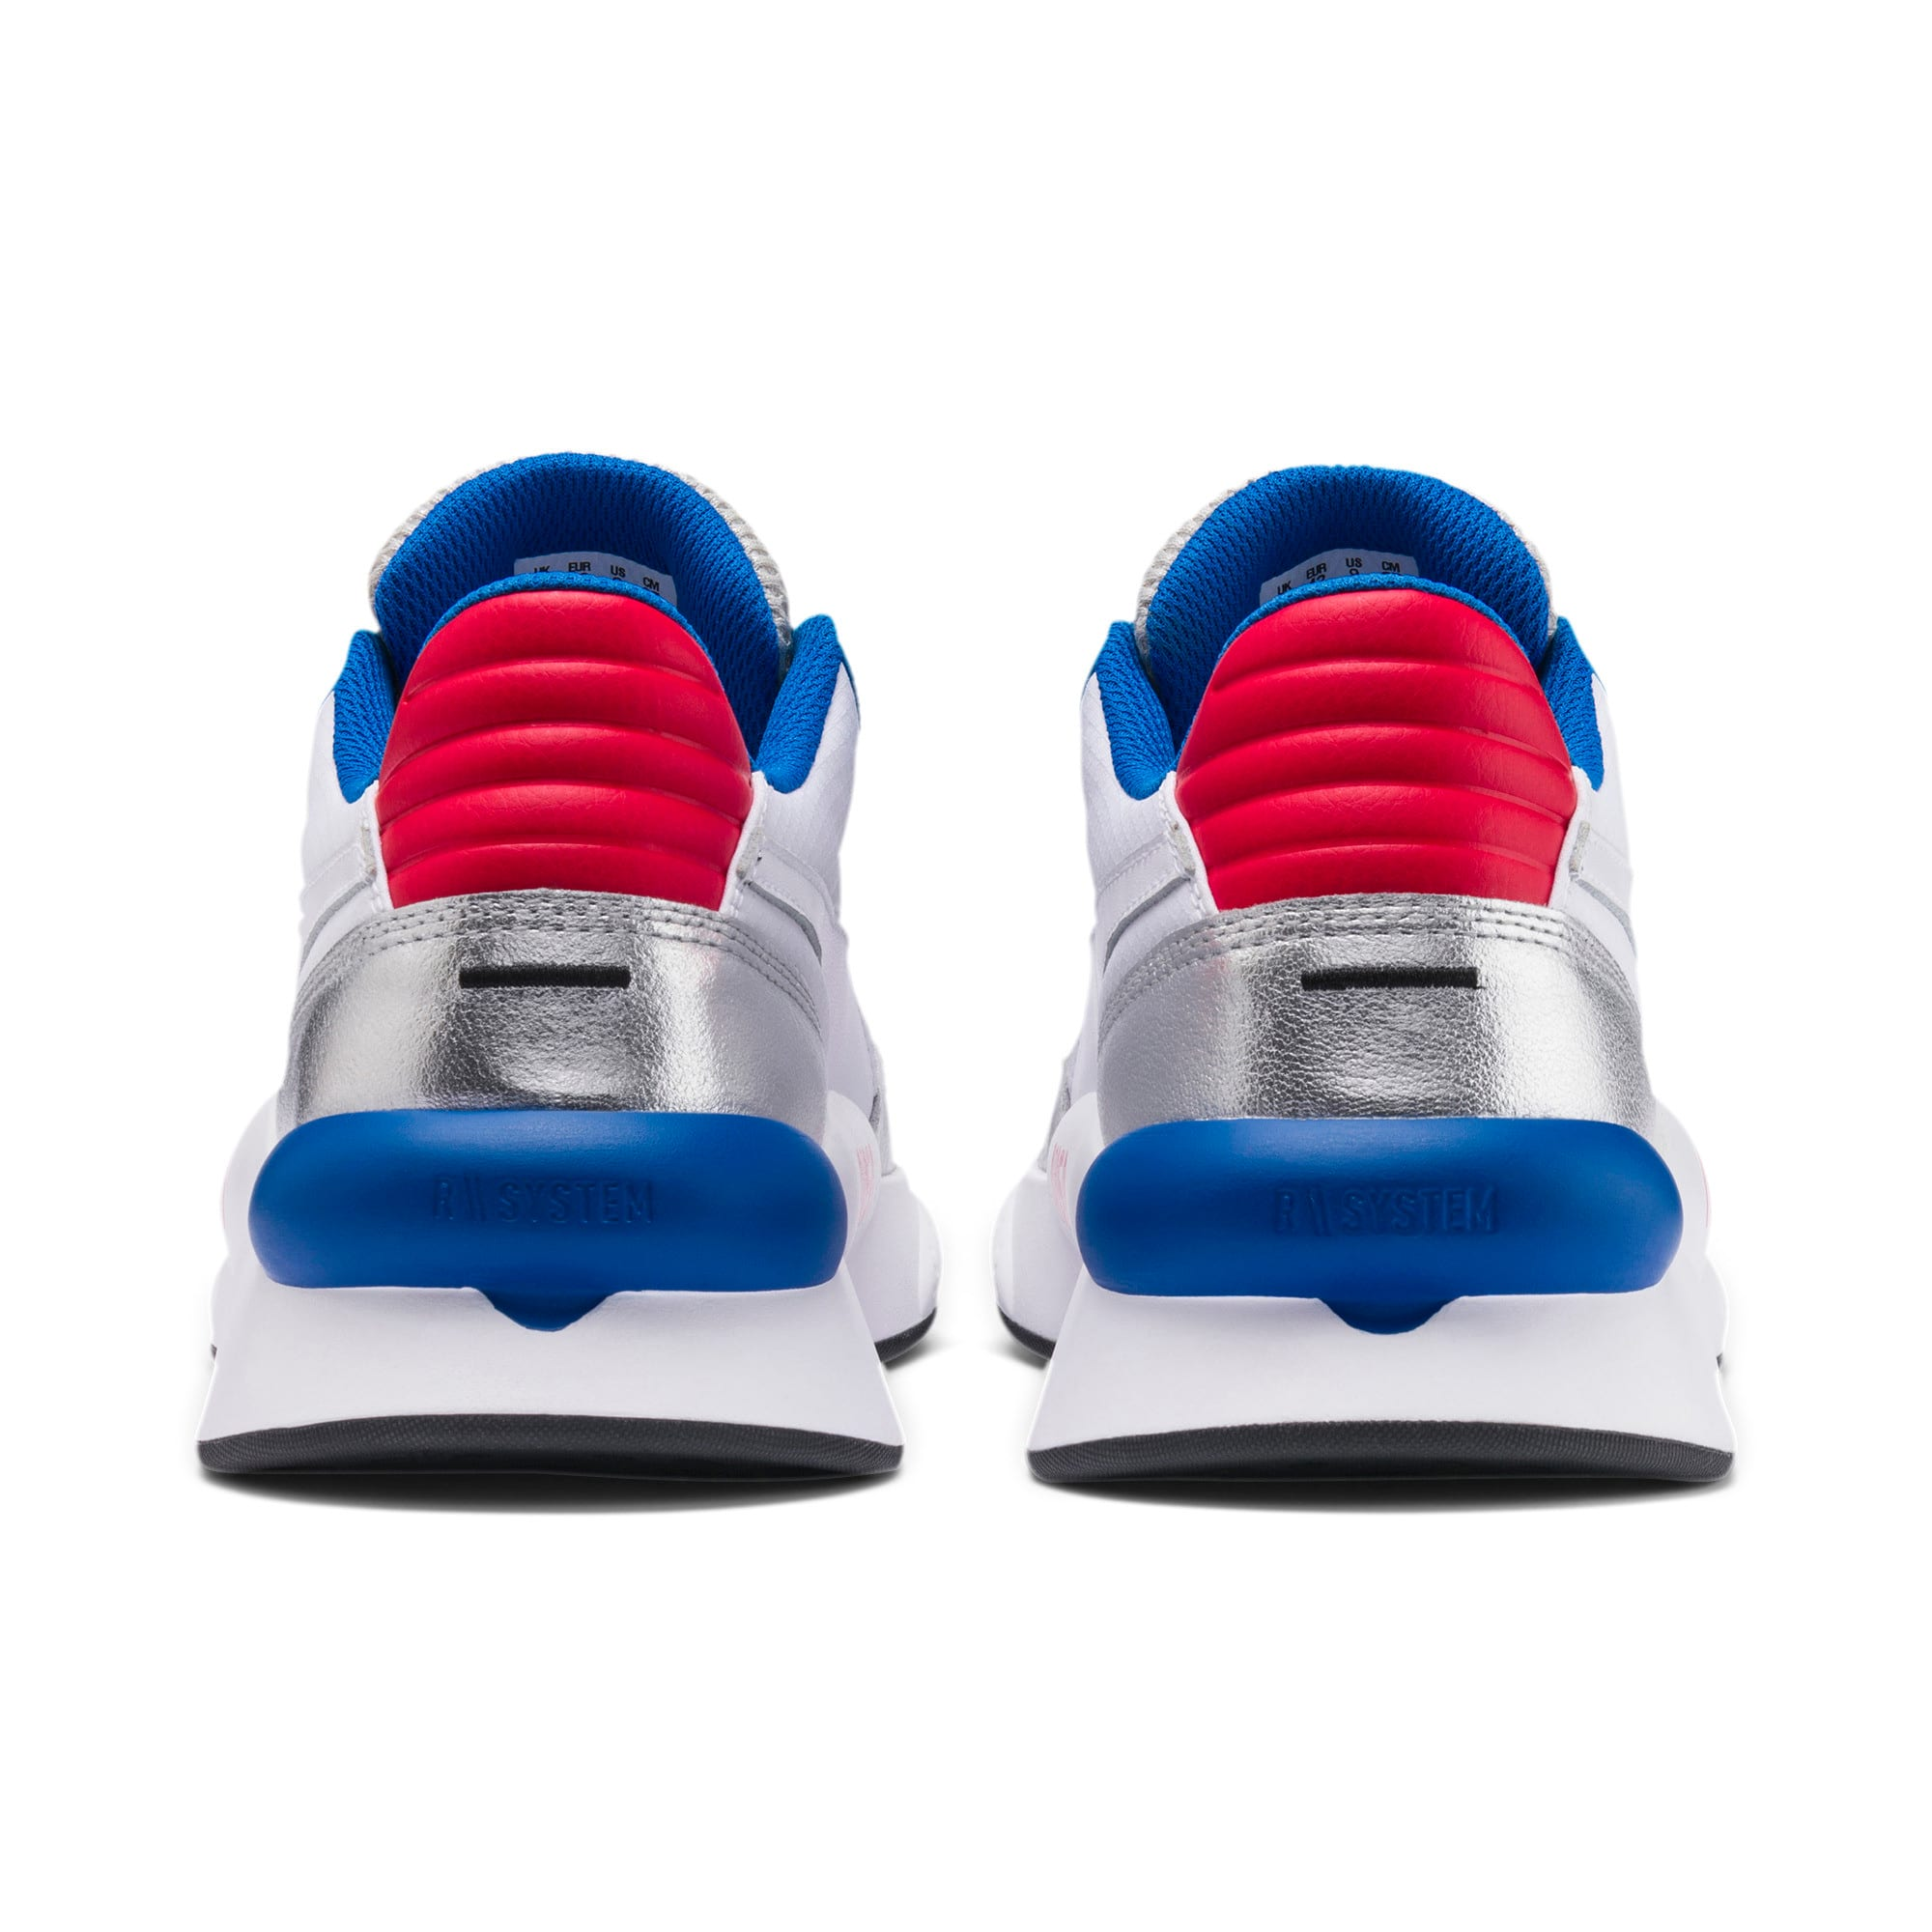 Thumbnail 3 of RS 9.8 Space Agency Sneakers, Puma White-Puma Silver, medium